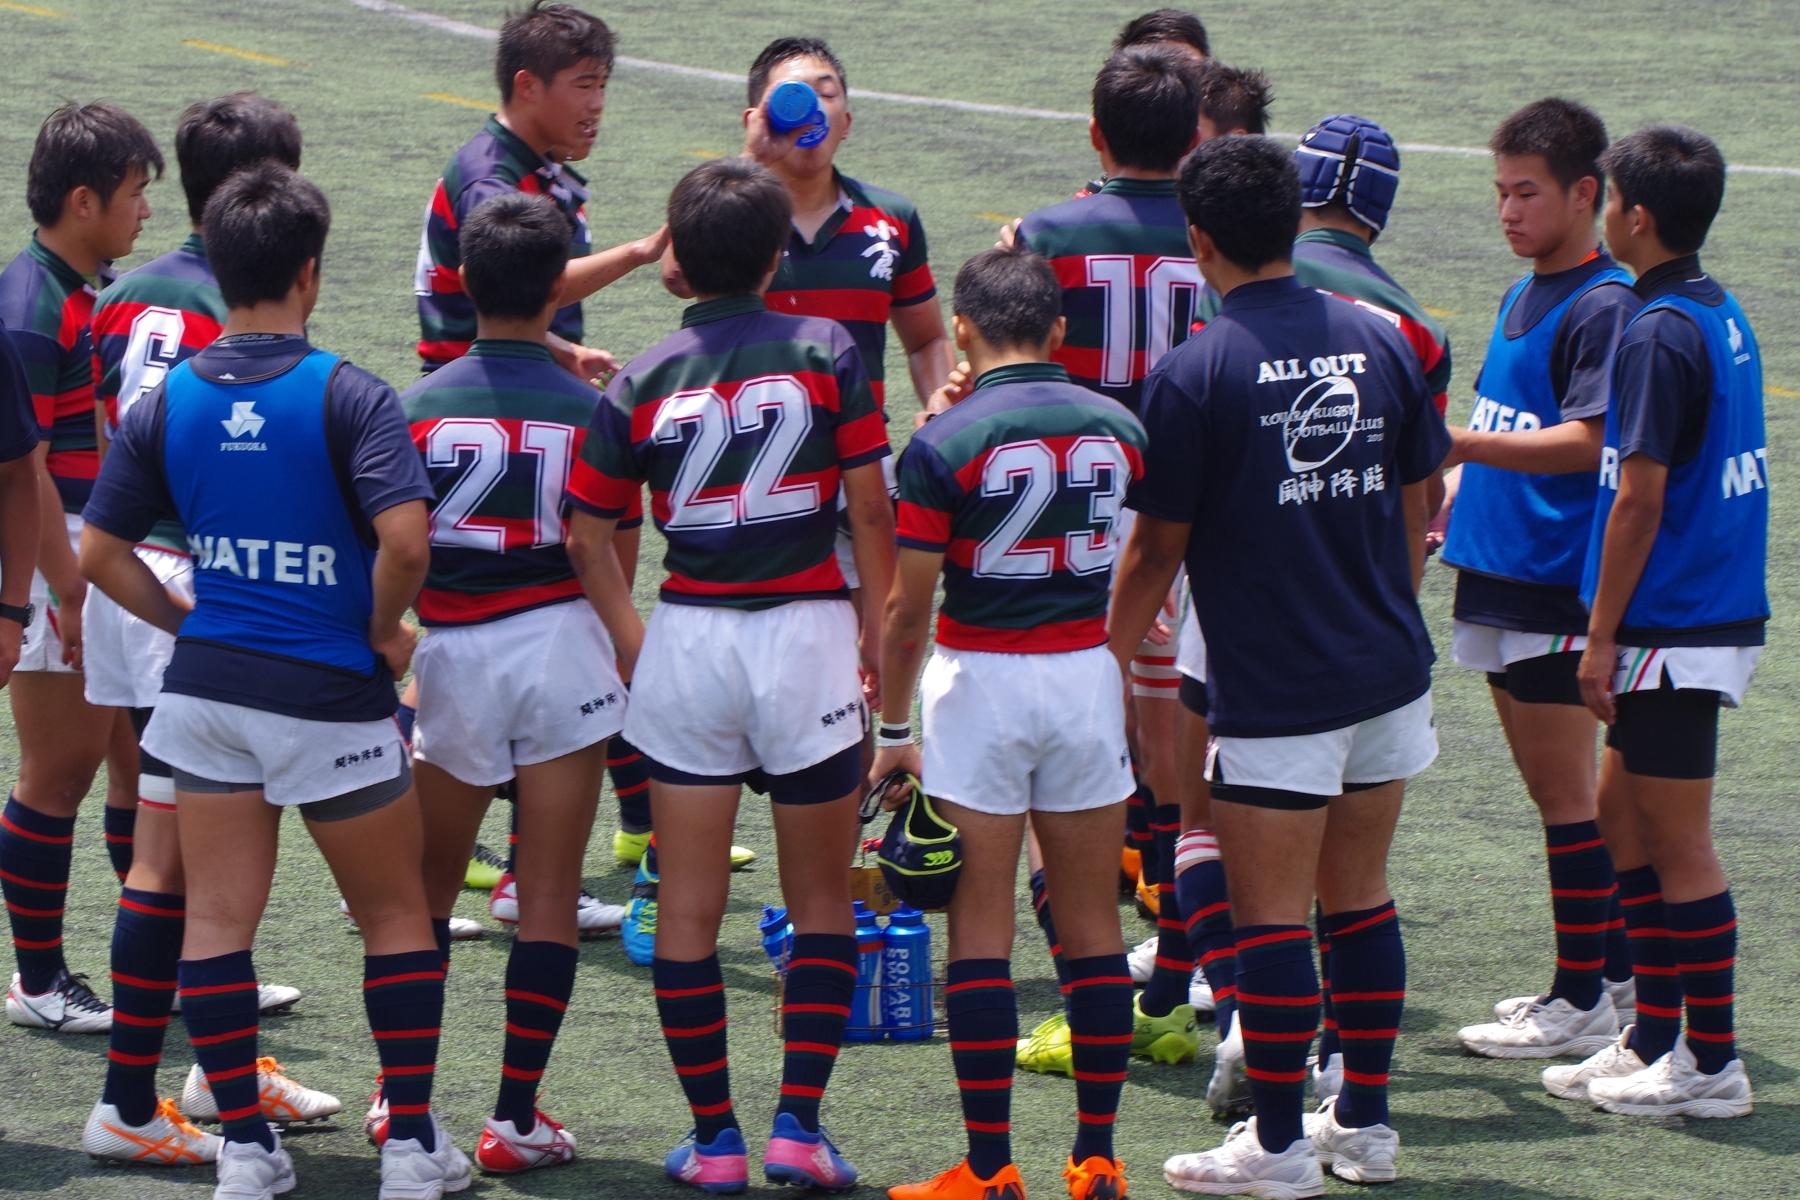 http://kokura-rugby.sakura.ne.jp/180609_130928_0596.jpg